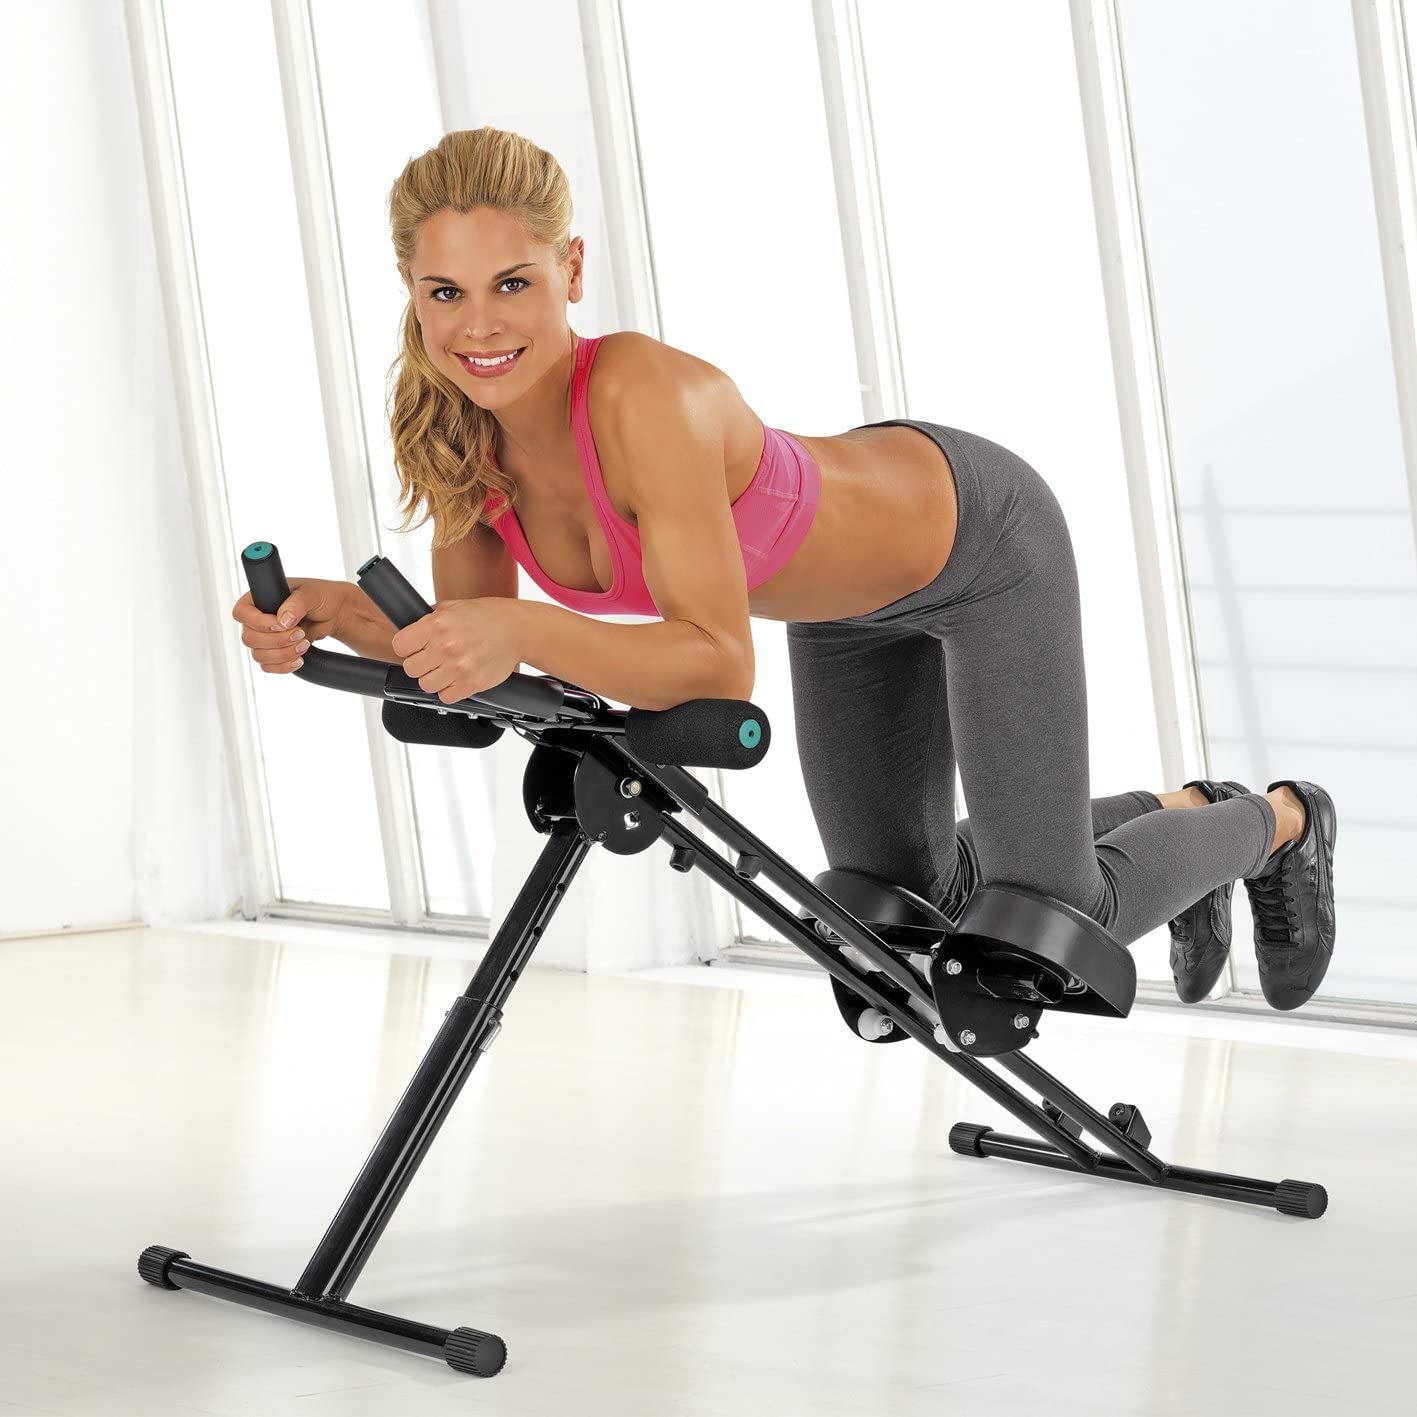 VITALmaxx 02678 Fitmaxx 5 Appareil d'entraînment | abdominaux pour fitness